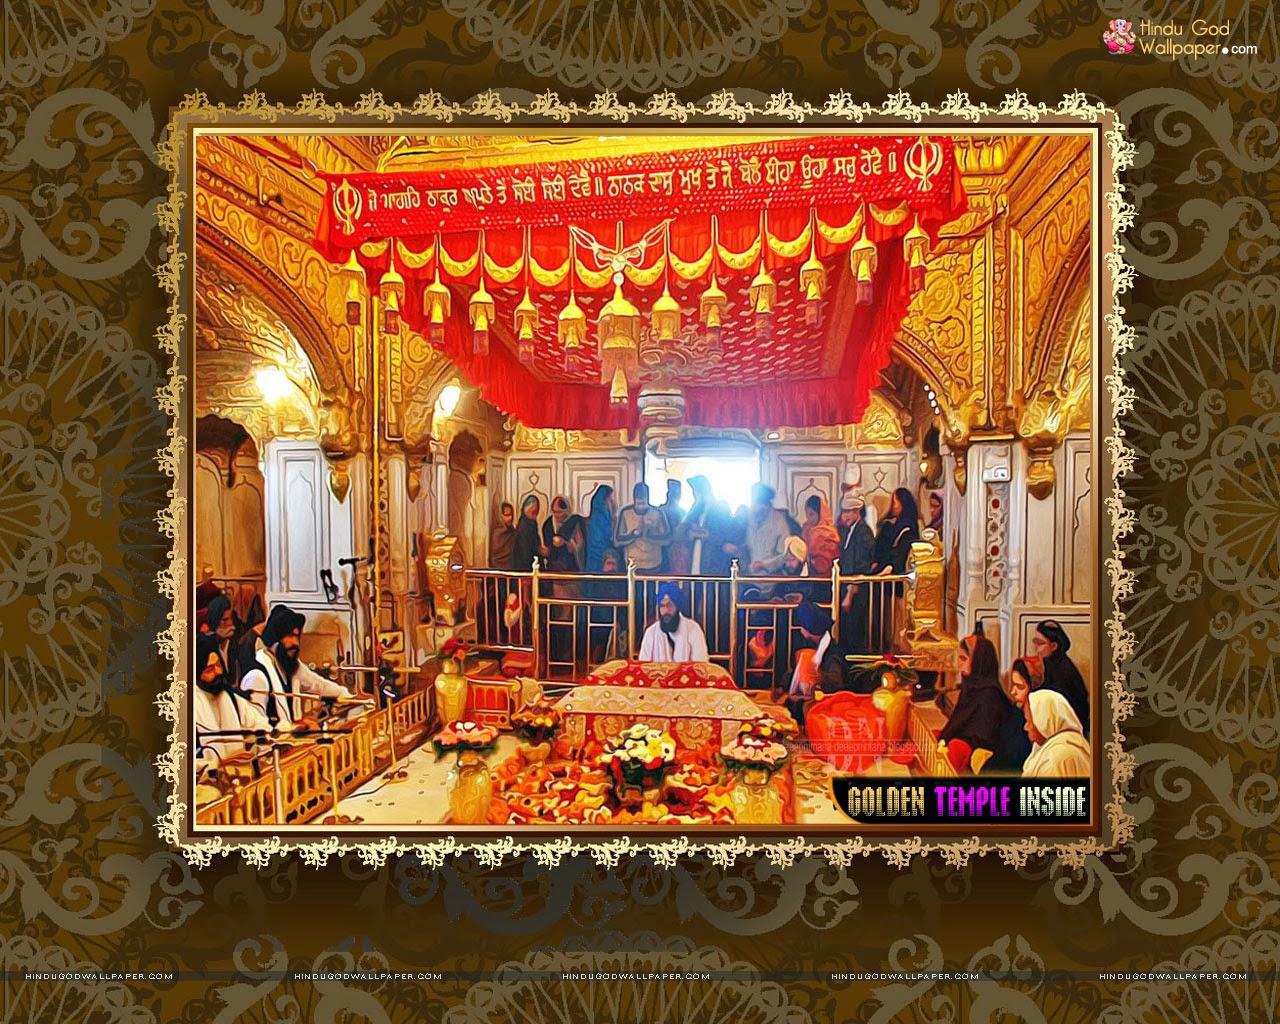 Shri Ram Ji Hd Wallpaper Golden Temple Hindu God Wallpapers Download